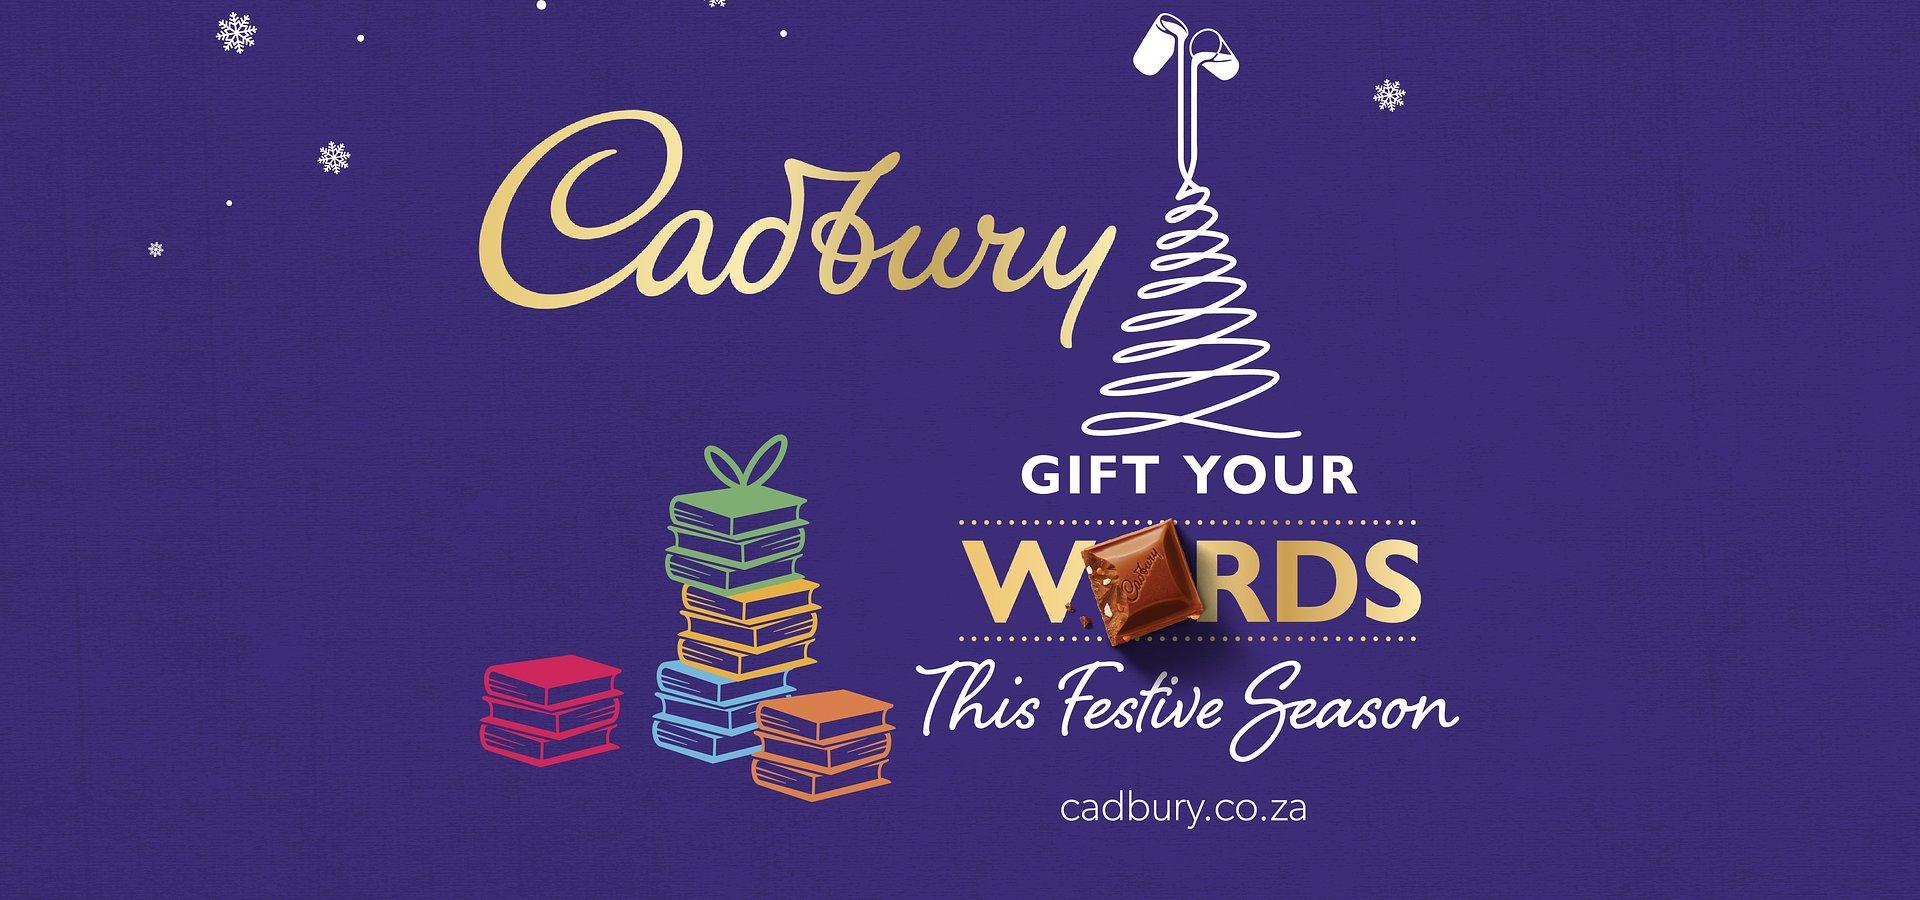 Gift the Perfect Pairing This Festive Season: Cadbury Festive Range and Storytime